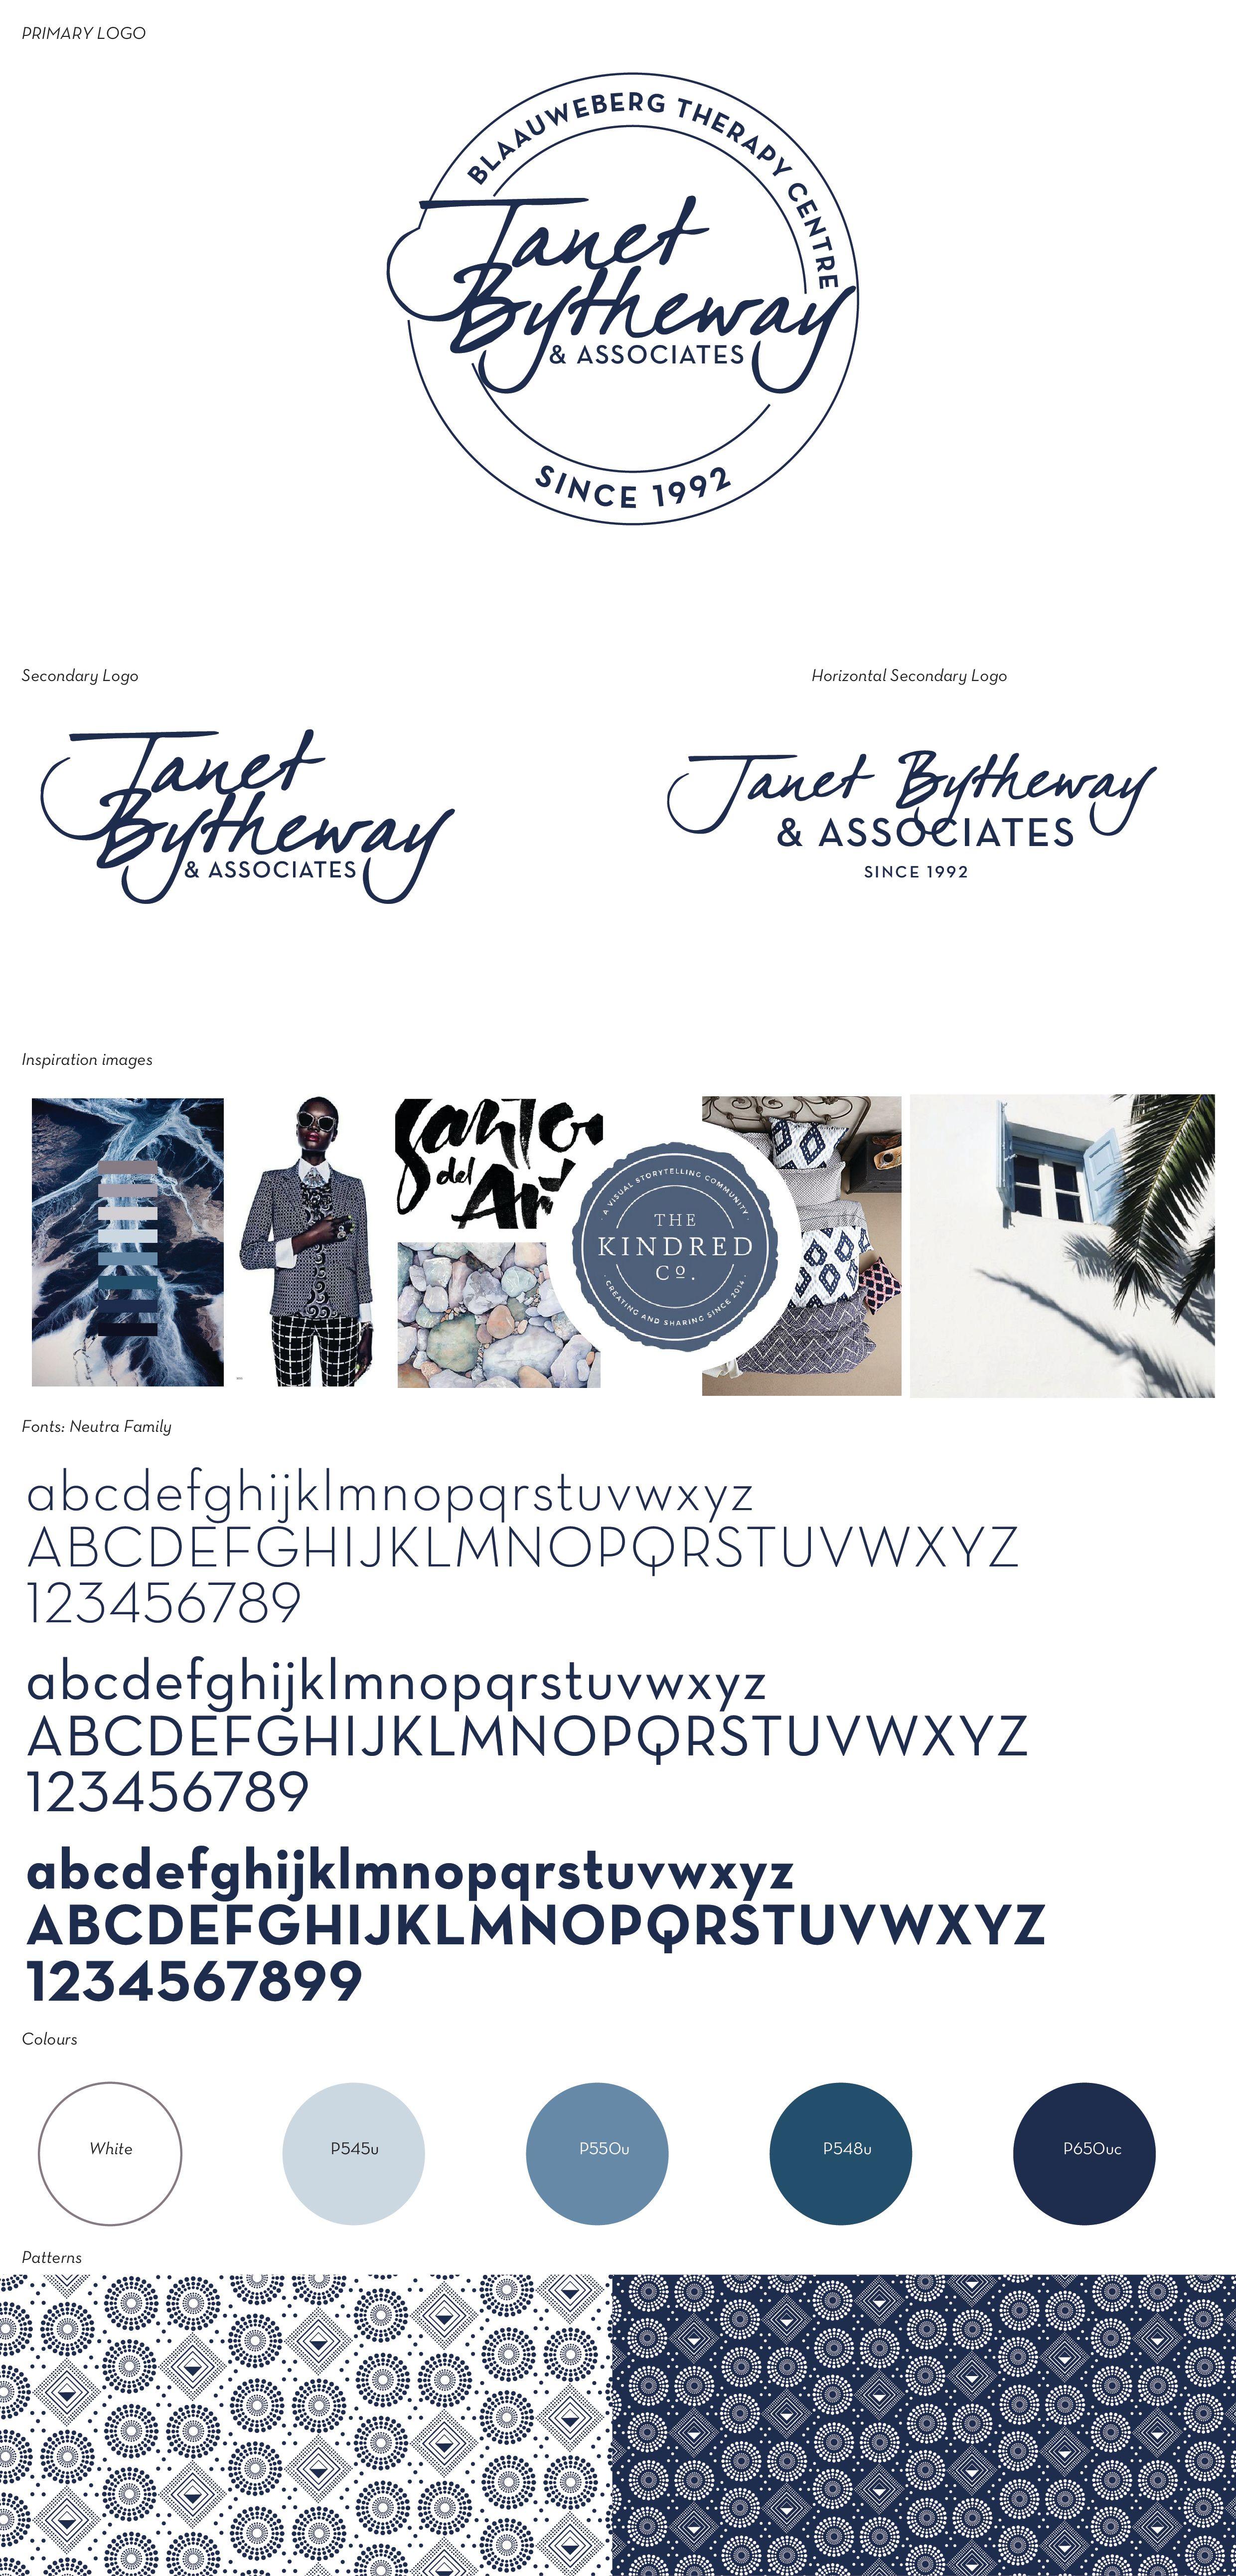 Branding Design Https Www Medesignstudio Me Janet Bytheway Branding Design Brand Guidelines Graphic Design Studios